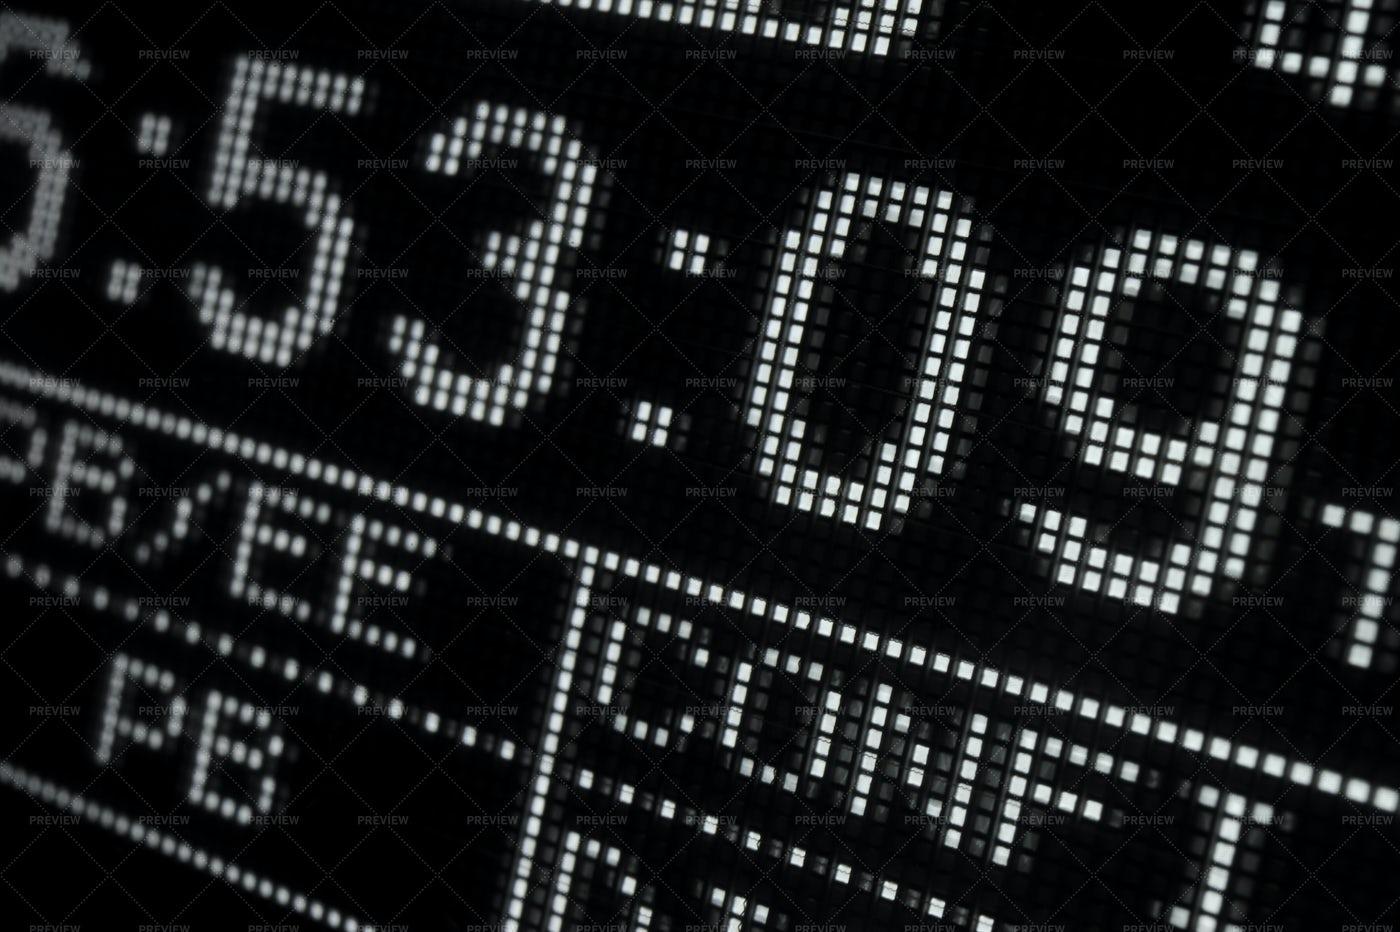 Display Of Video Recorder: Stock Photos